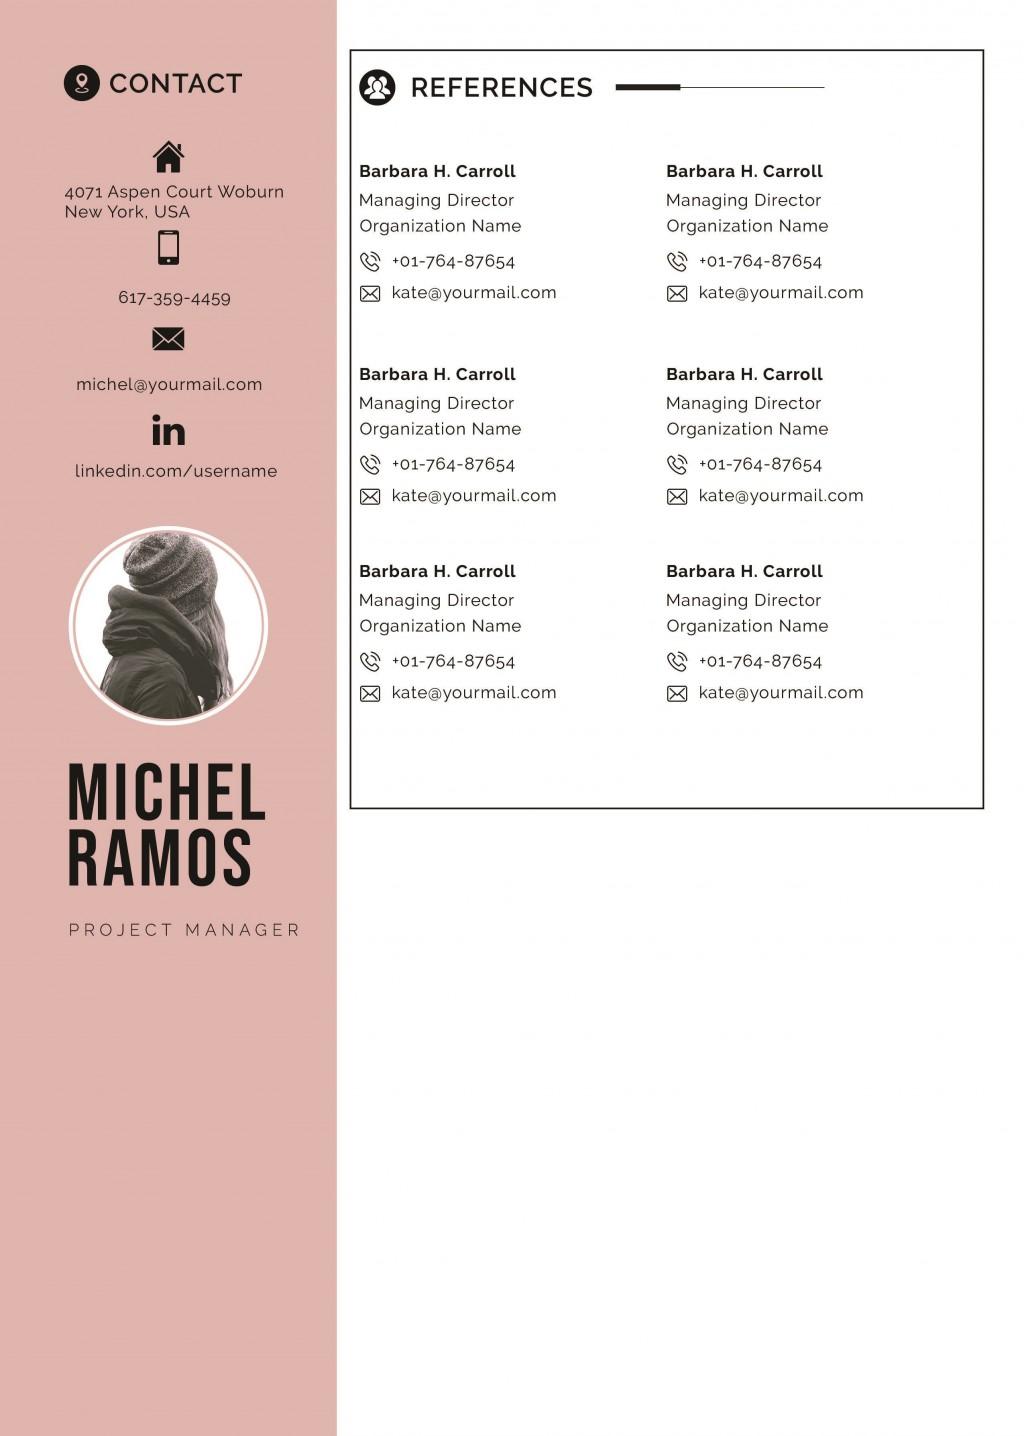 003 Wonderful Resume Reference Template Microsoft Word High Resolution  ListLarge